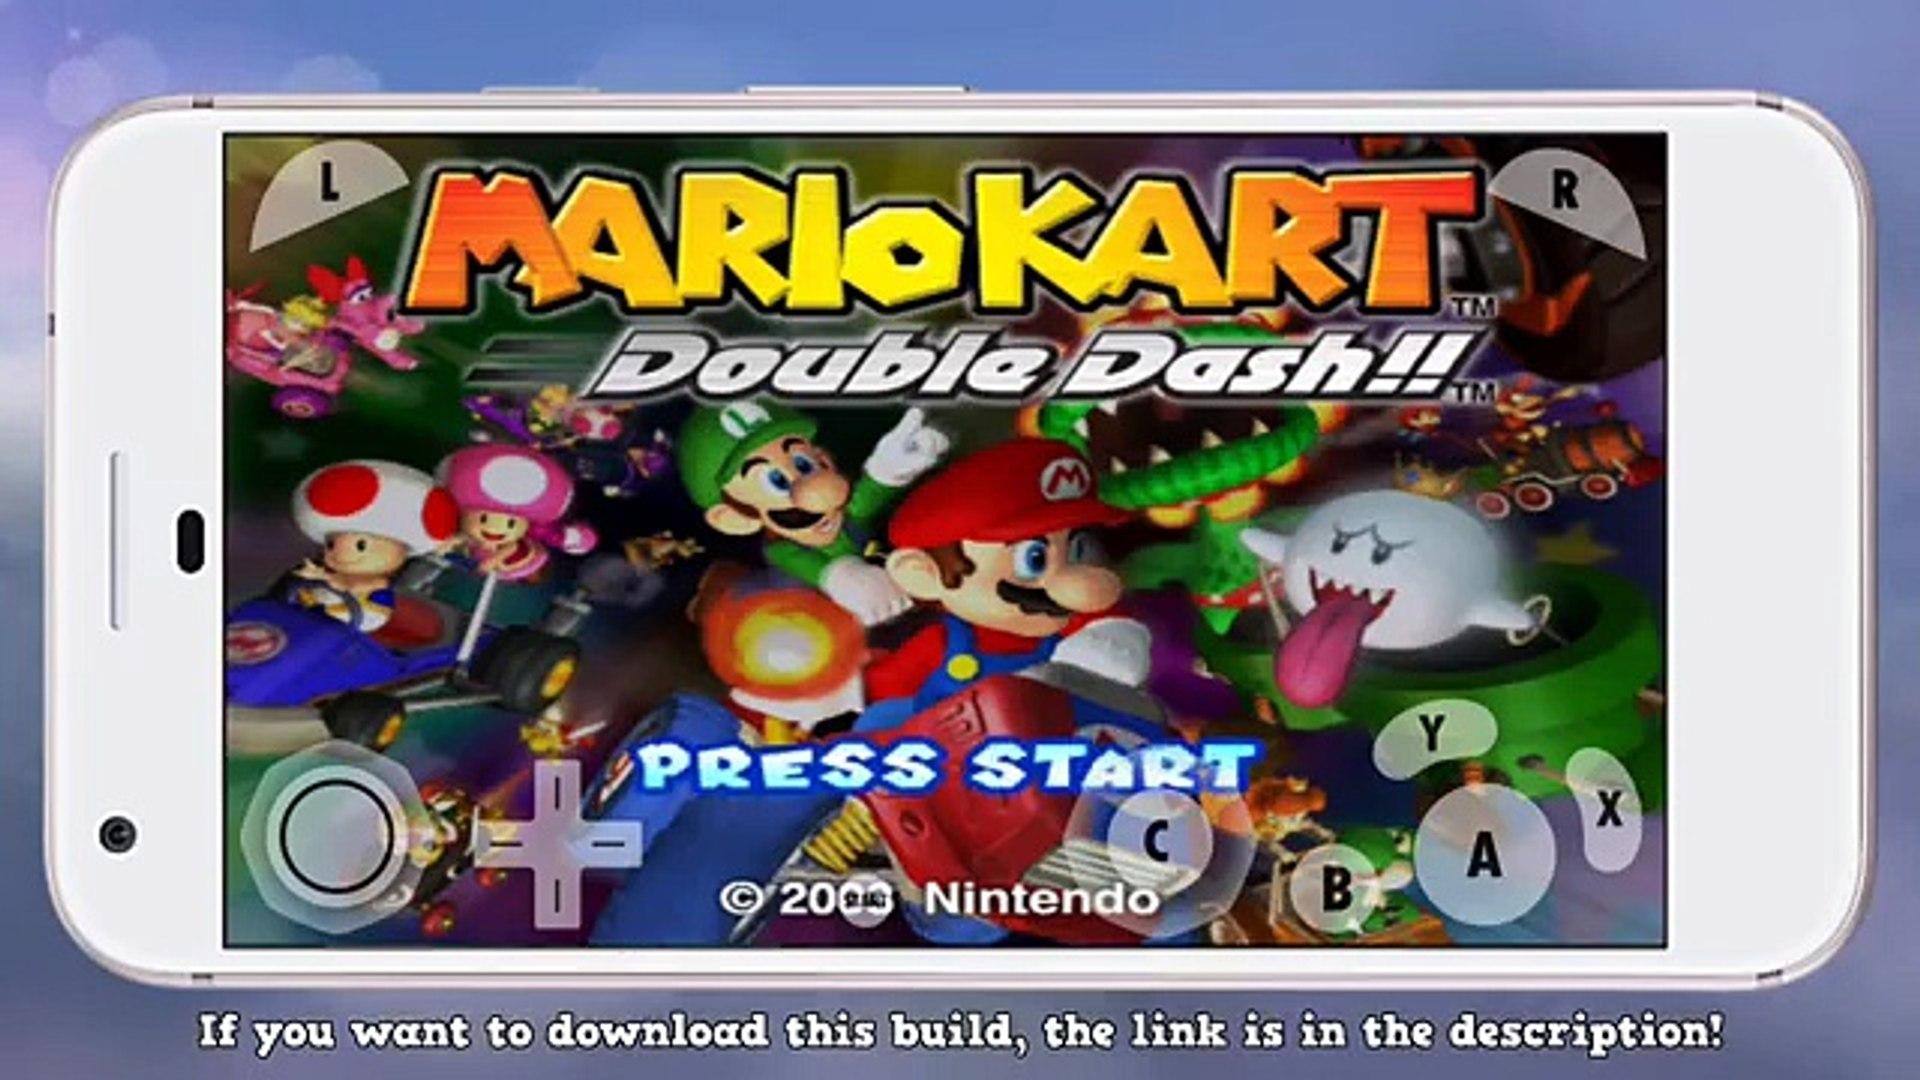 Mario Kart Wii Double Dash On Google Pixel Xl Dolphin Emulator Android Test